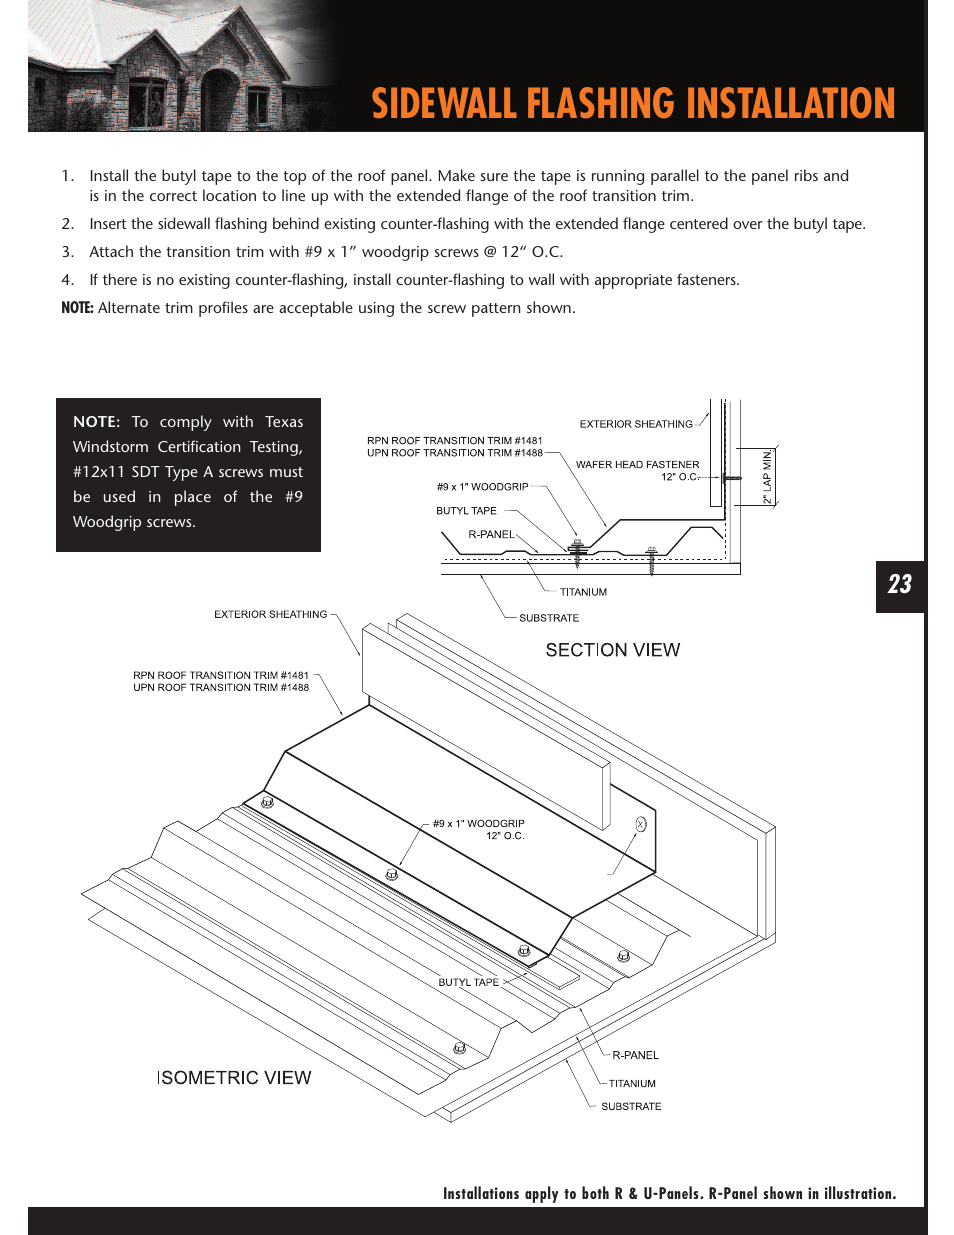 Sidewall flashing installation mueller u panel user manual sidewall flashing installation mueller u panel user manual page 23 28 1betcityfo Choice Image